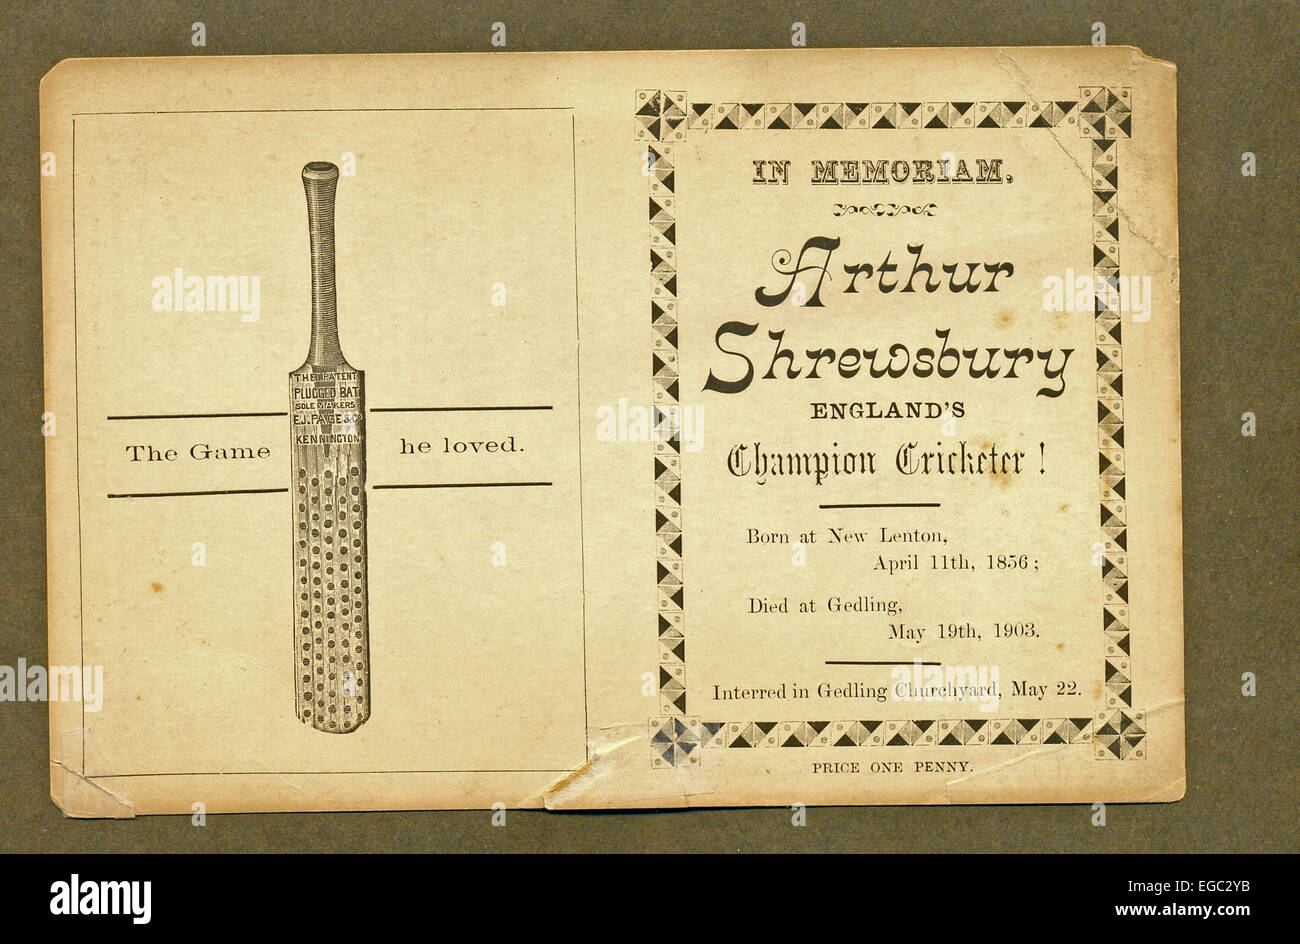 Tarjeta conmemorativa para Arthur Shrewsbury, Inglaterra Cricketer 'Campeón' Foto de stock